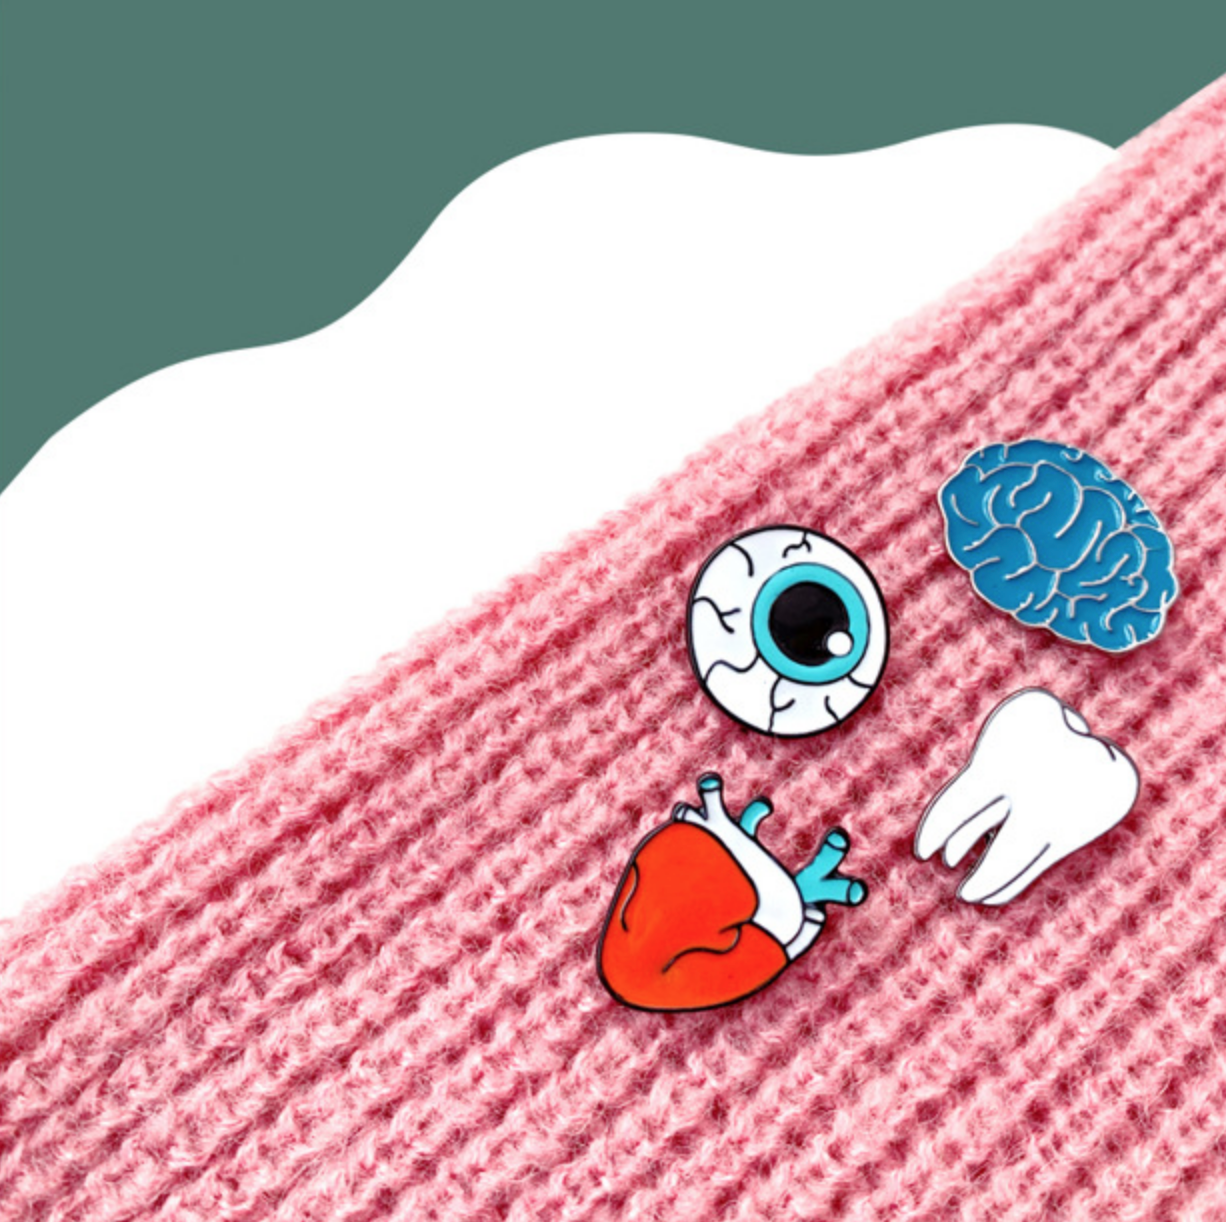 Eyeball Pin